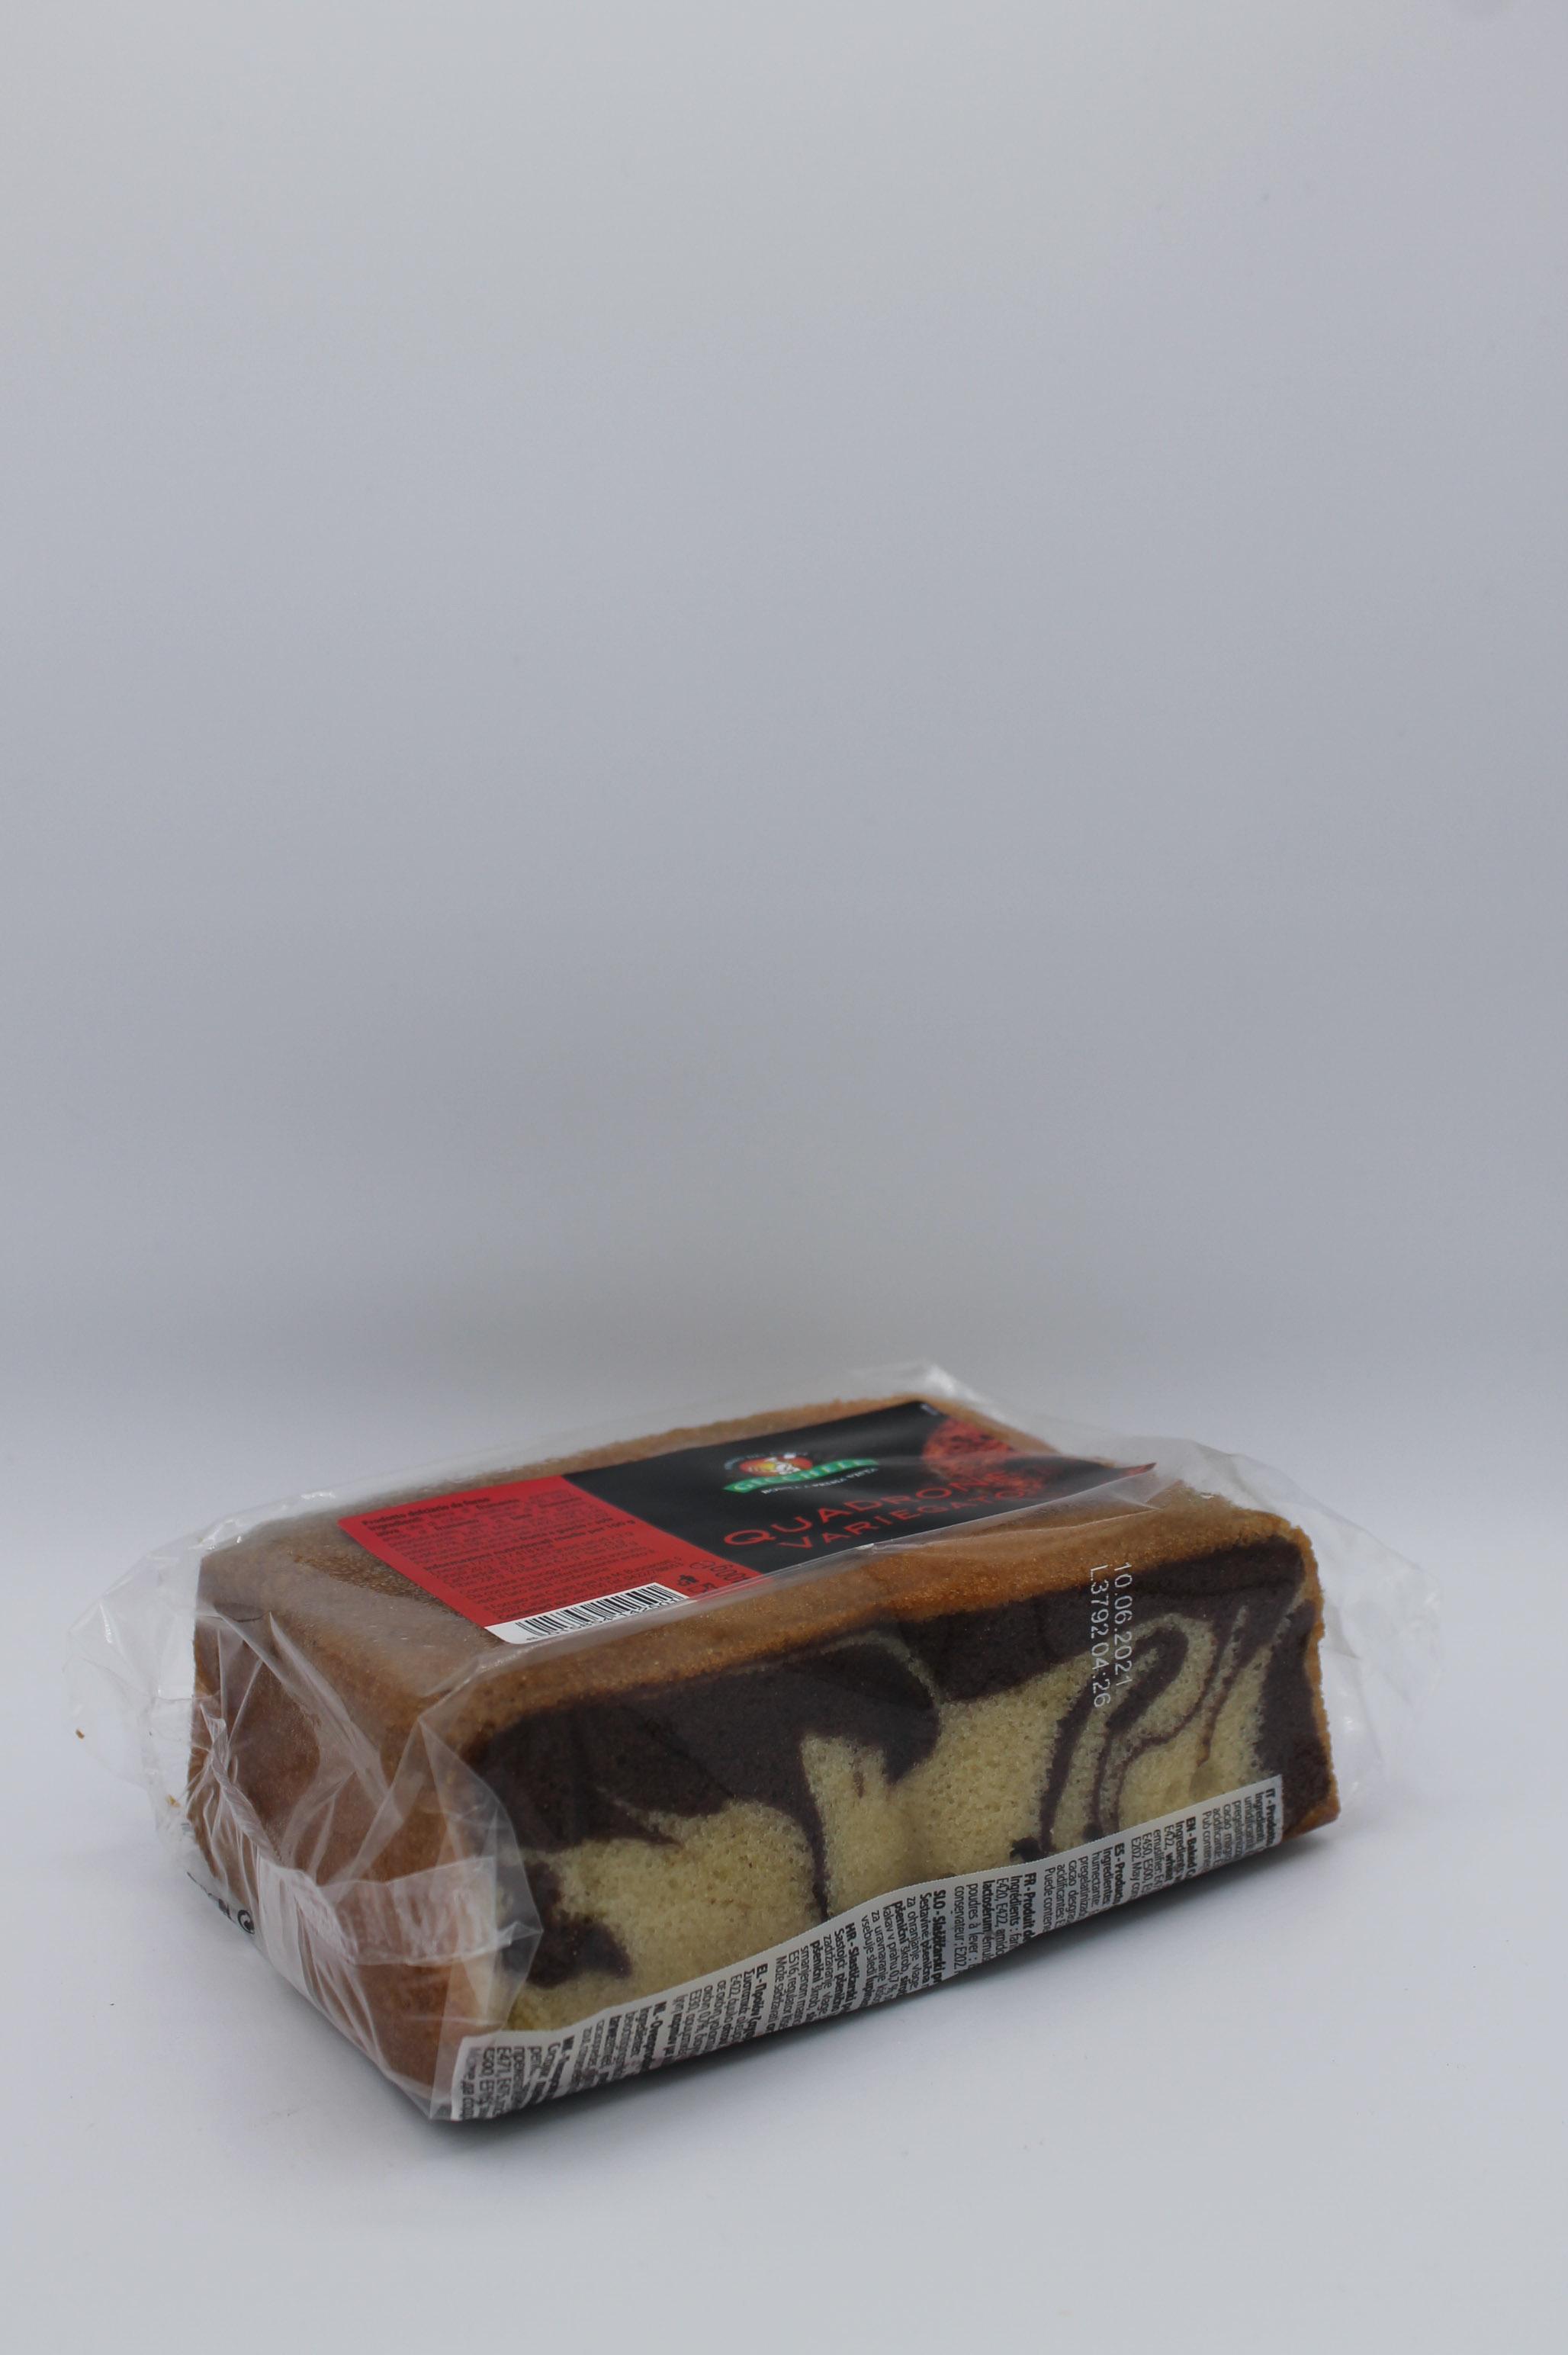 Gecchele torta quadrone variegato 400gr.